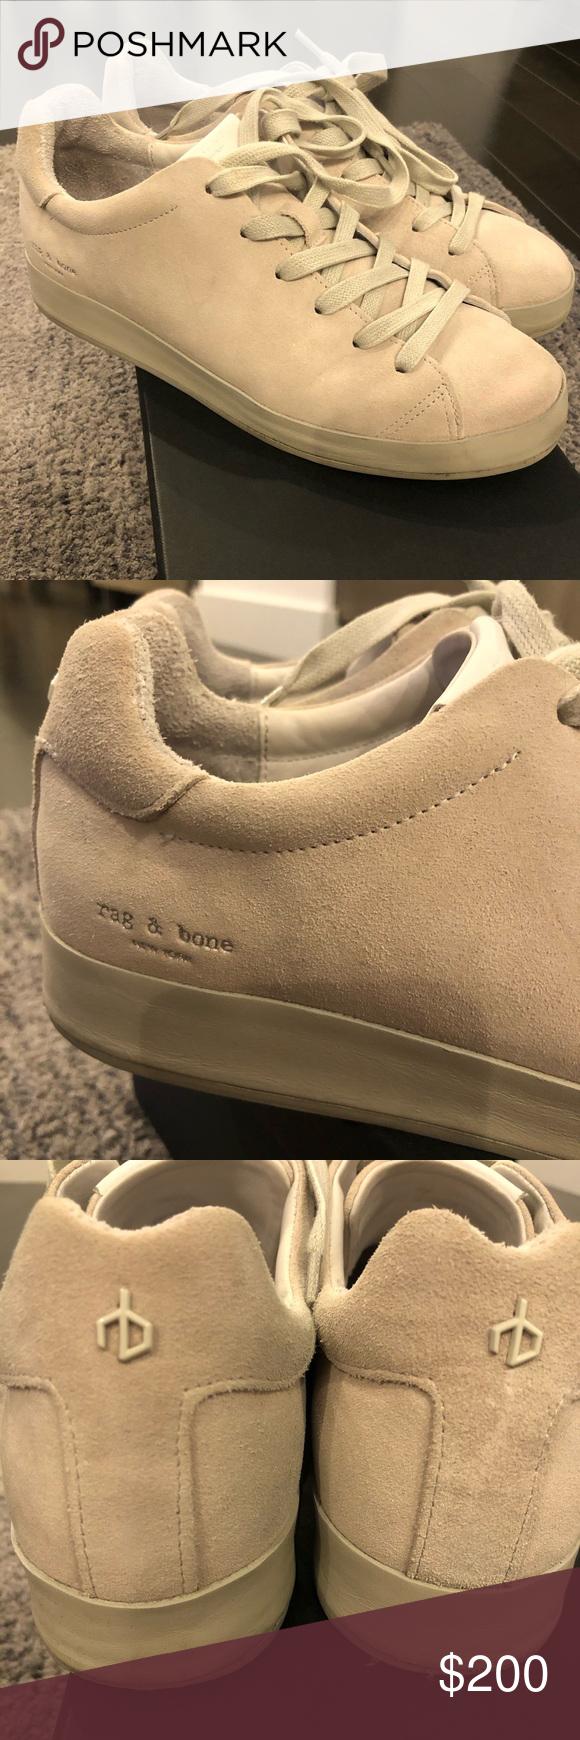 Rag and Bone sneakers RB1 Low Suede Sneakers  Gray  Off whiteish color Im  Rag and Bone sneakers RB1 Low Suede Sneakers  Gray  Off whiteish color Im